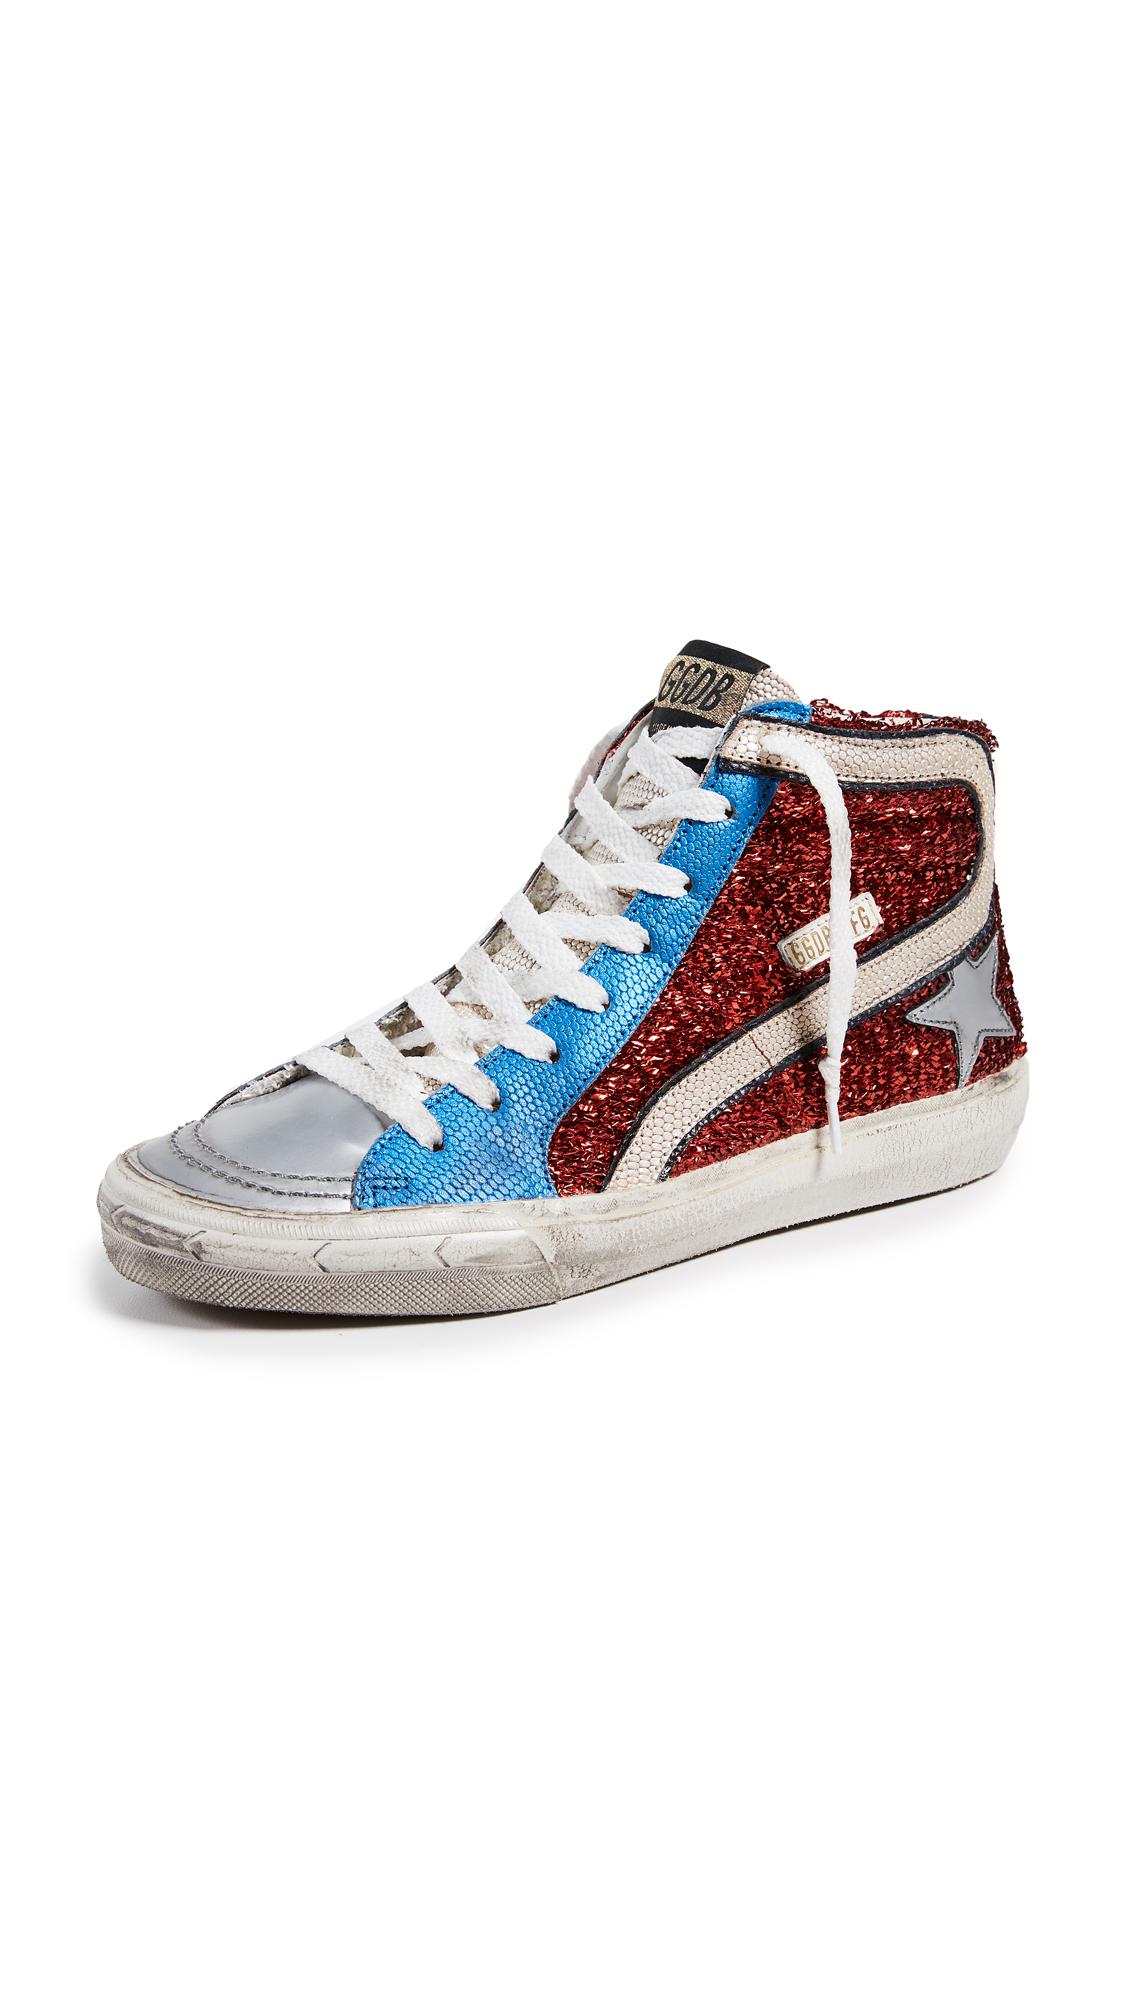 Golden Goose Slide Sneakers - Red/Blue/Gold